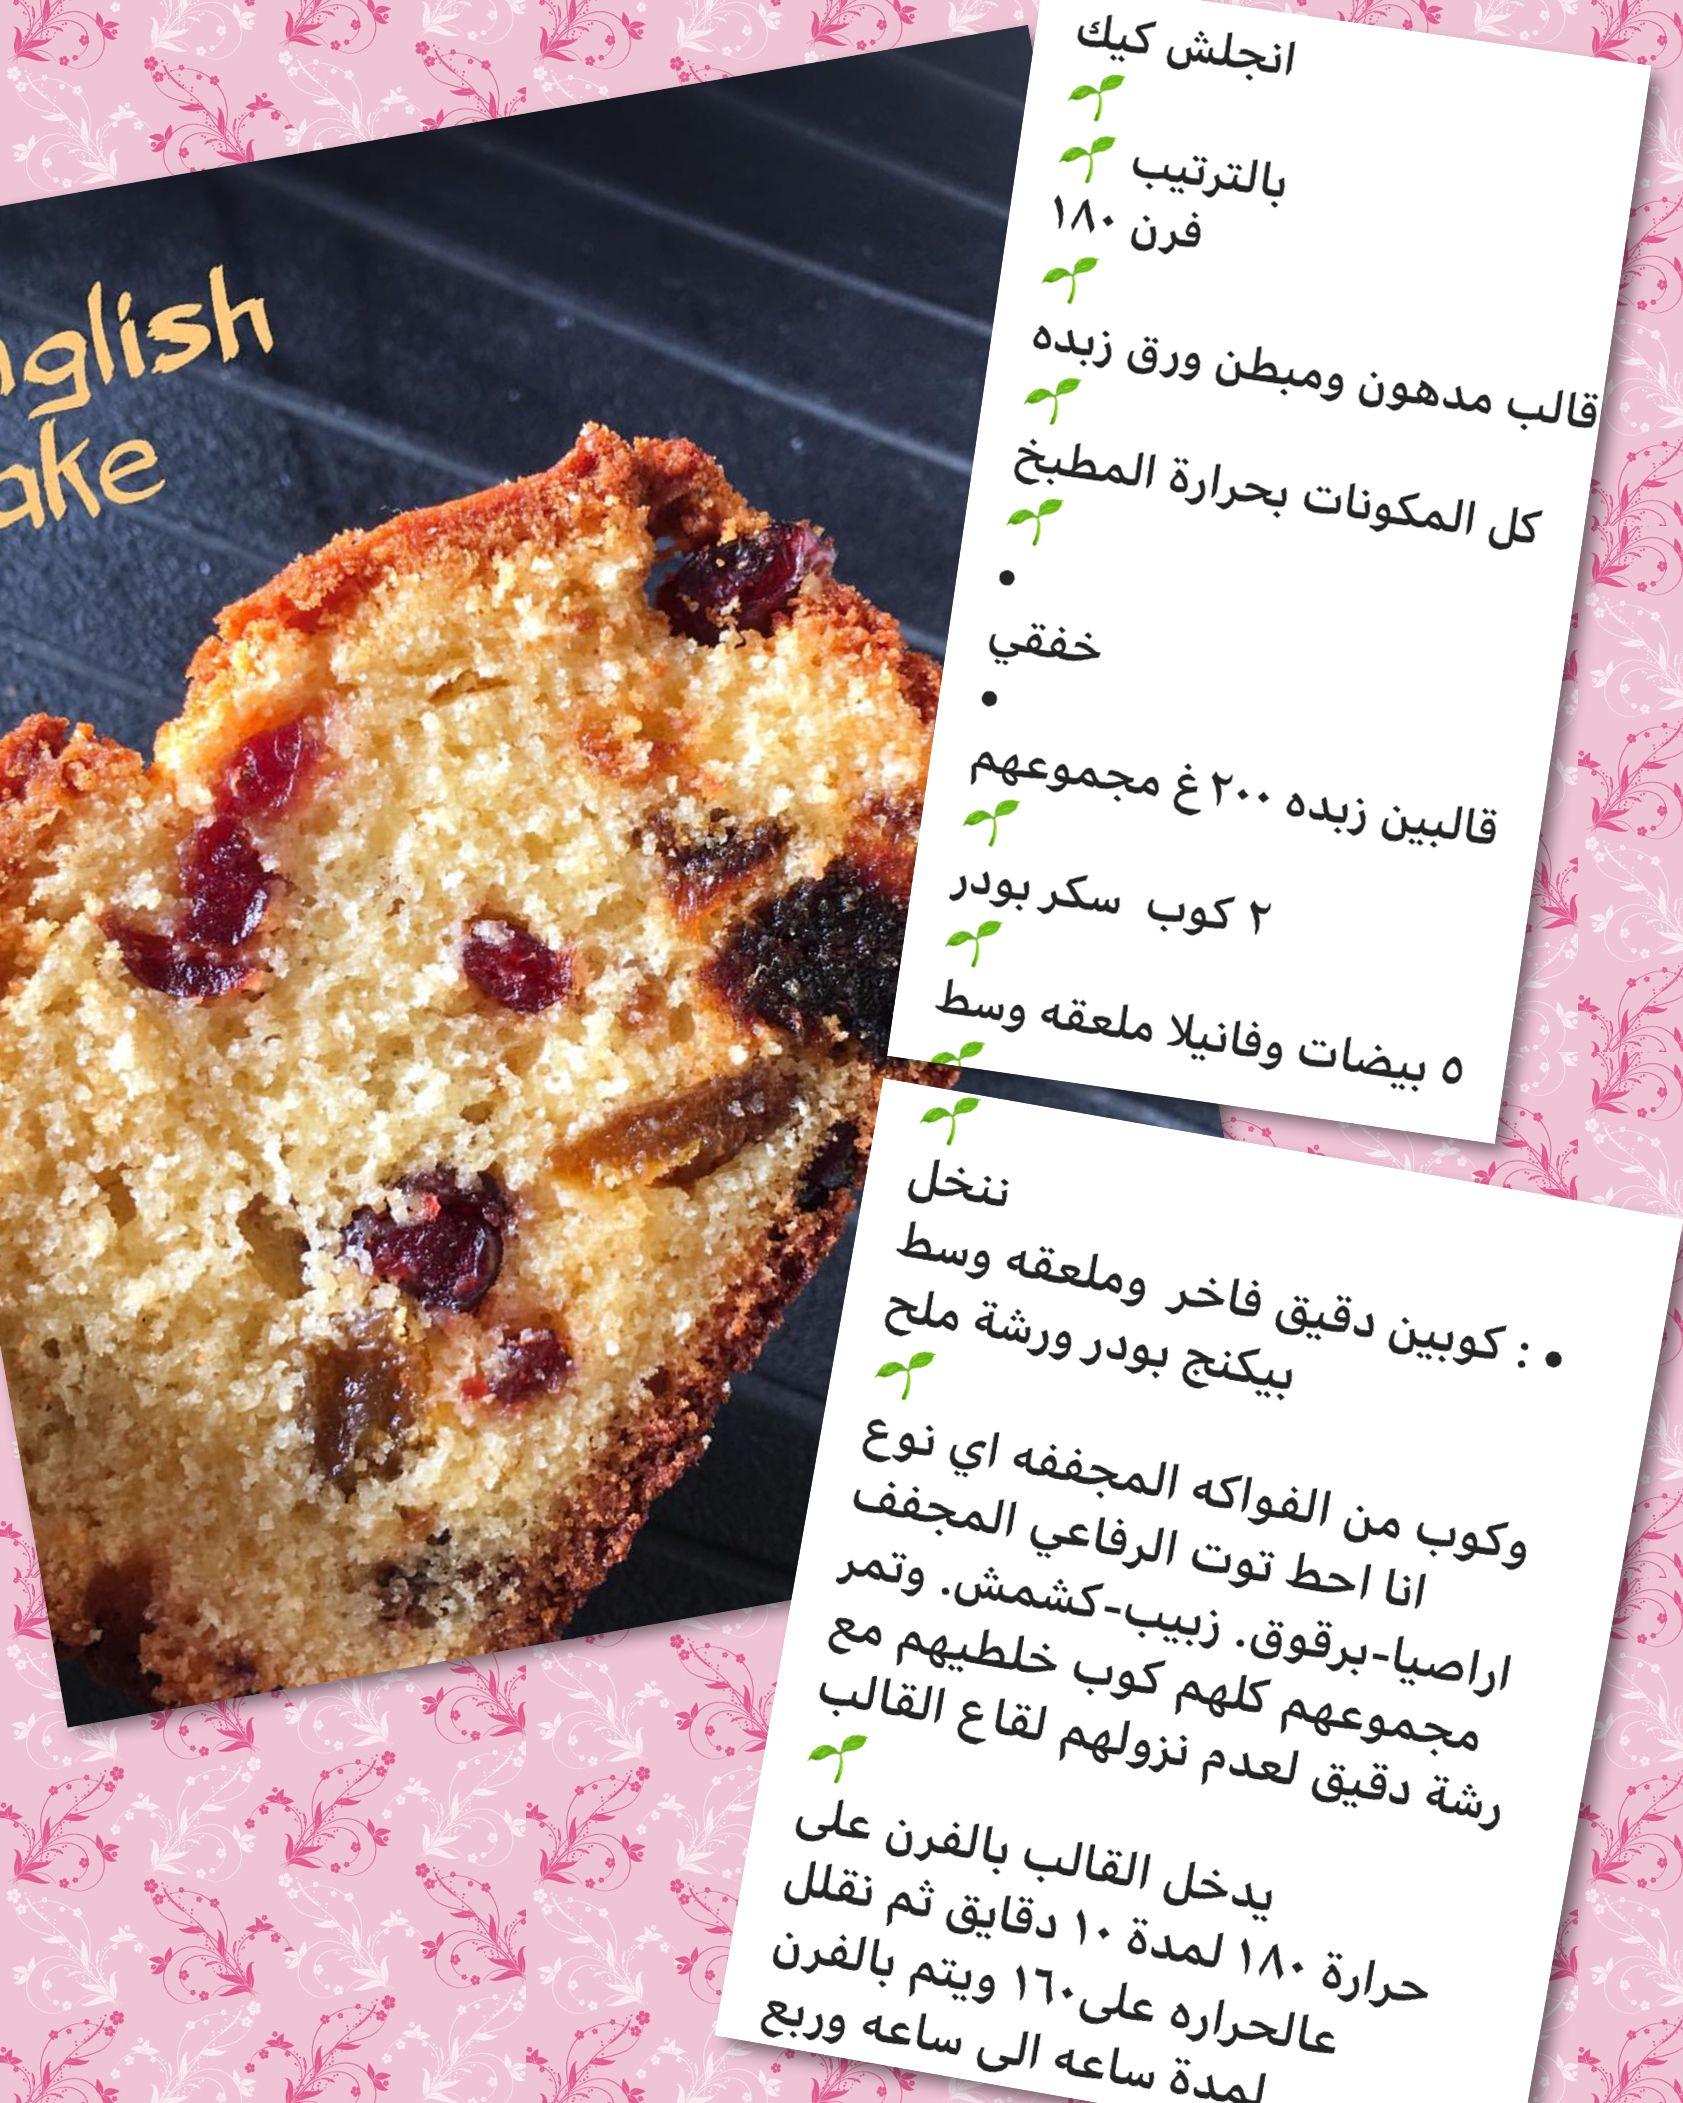 انجلش كيك Arabic Food Recipes No Bake Cake